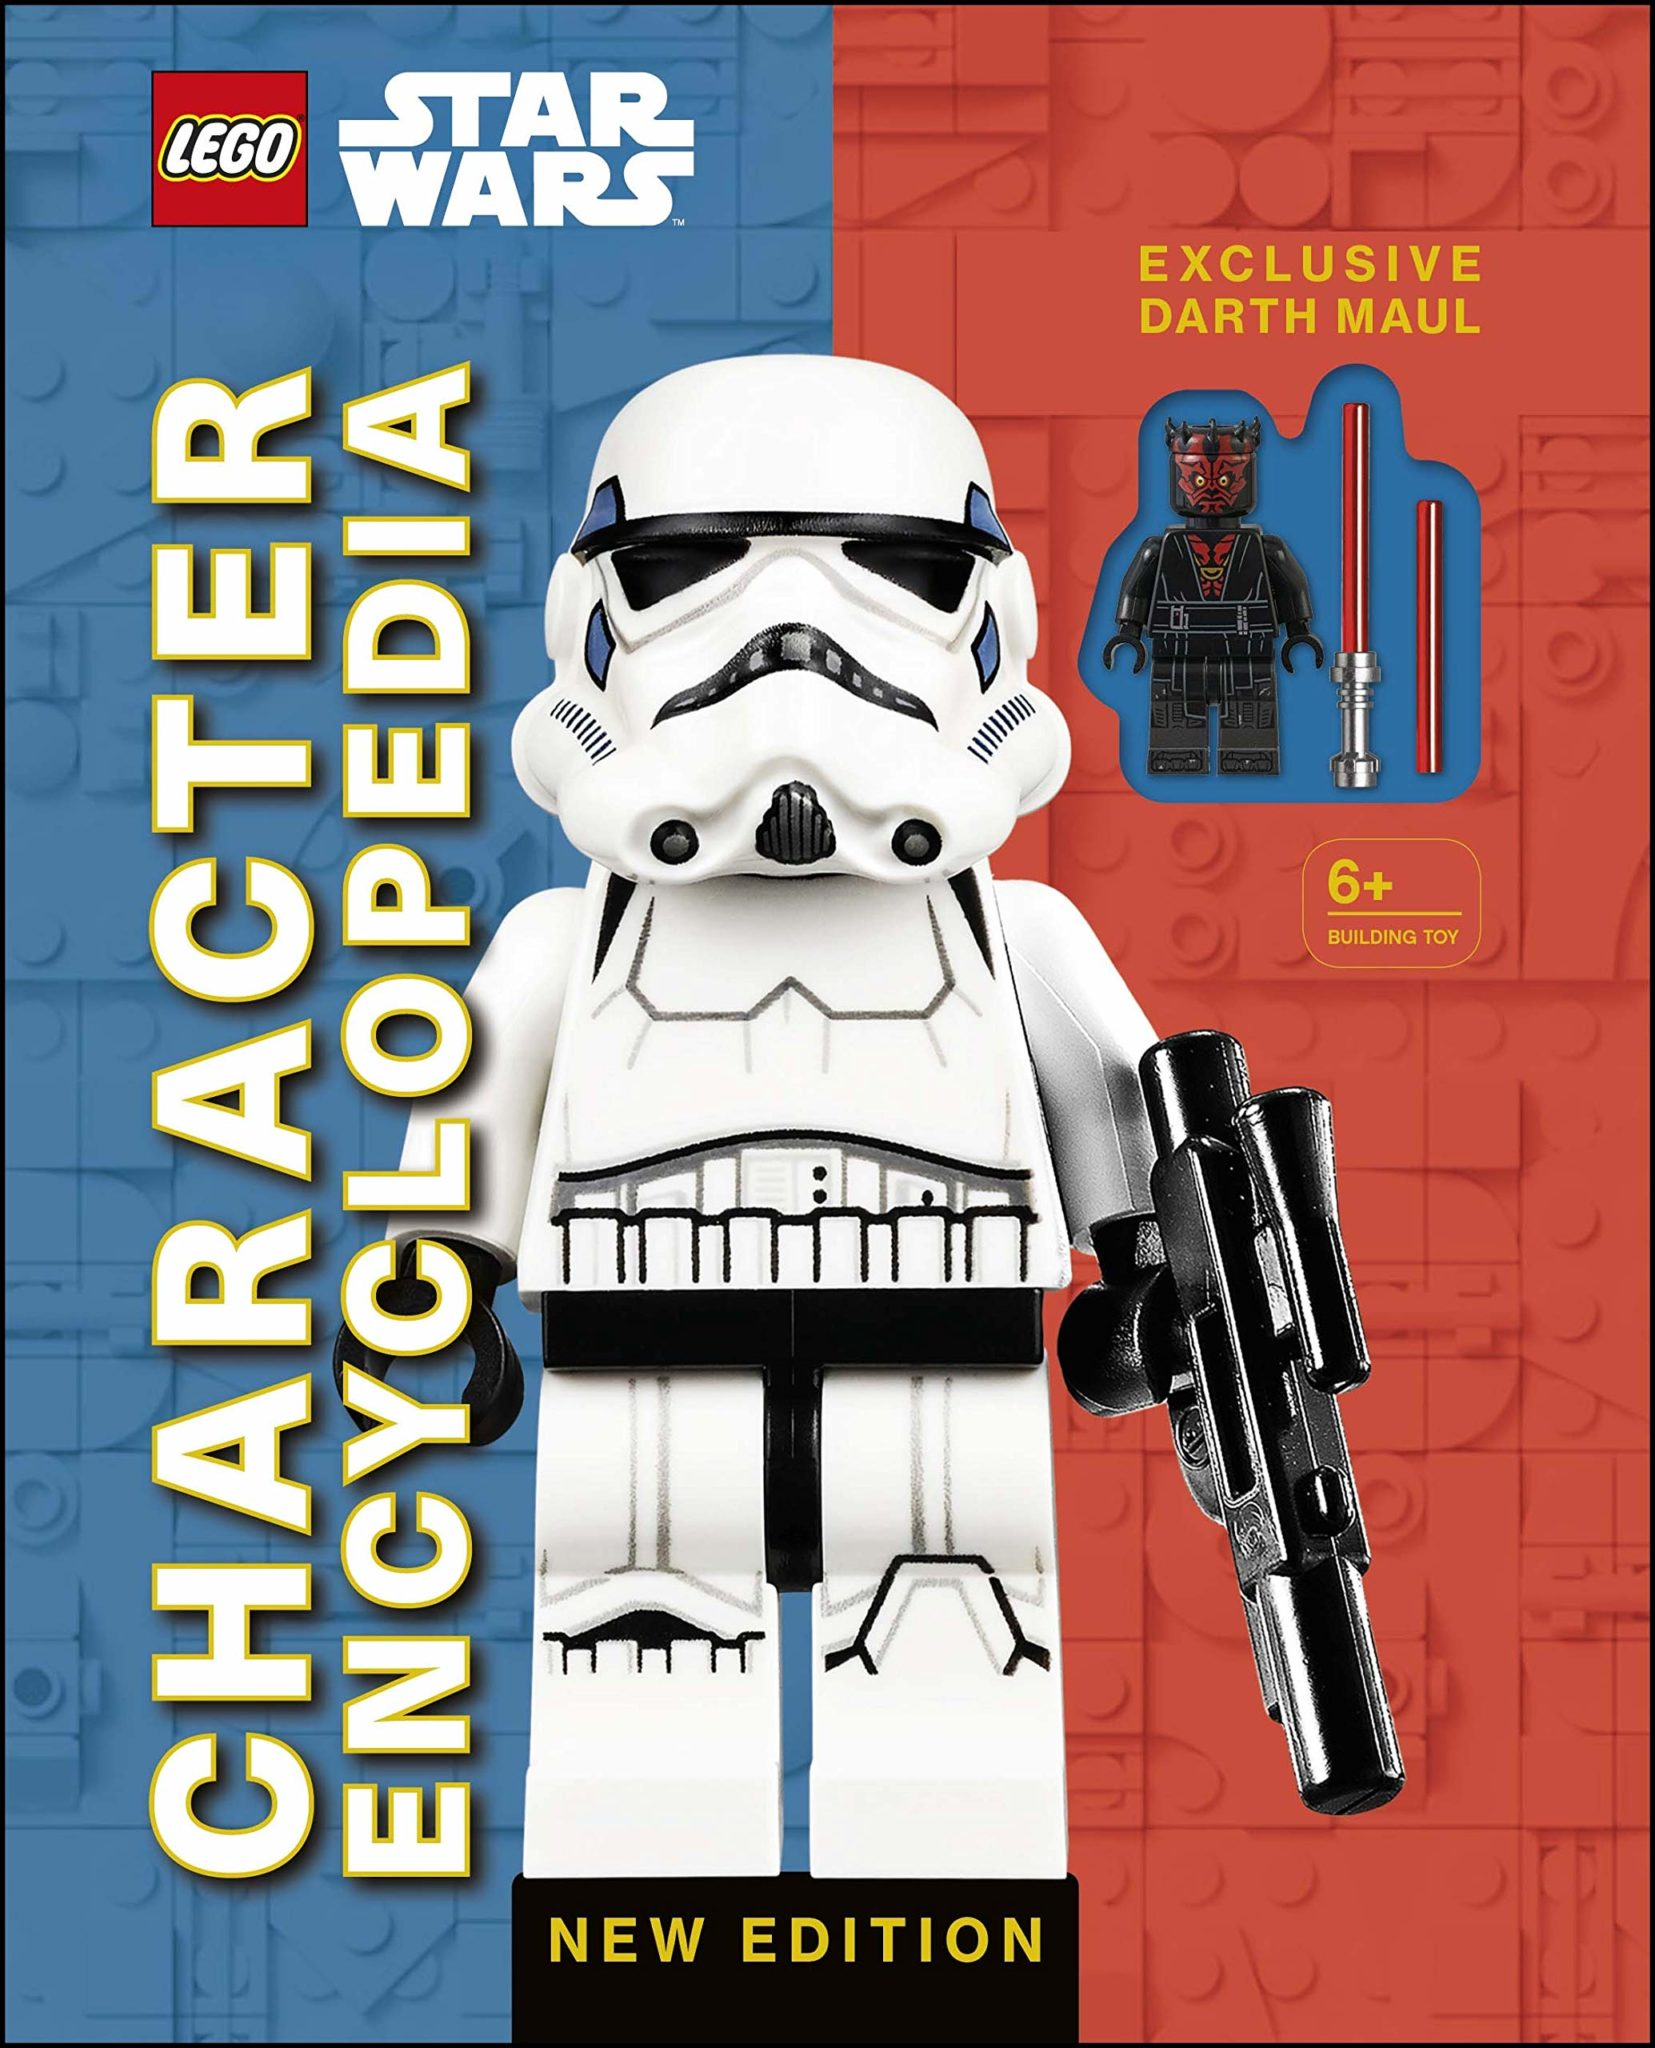 LEGO Star Wars Lexikon der Minifiguren 2020